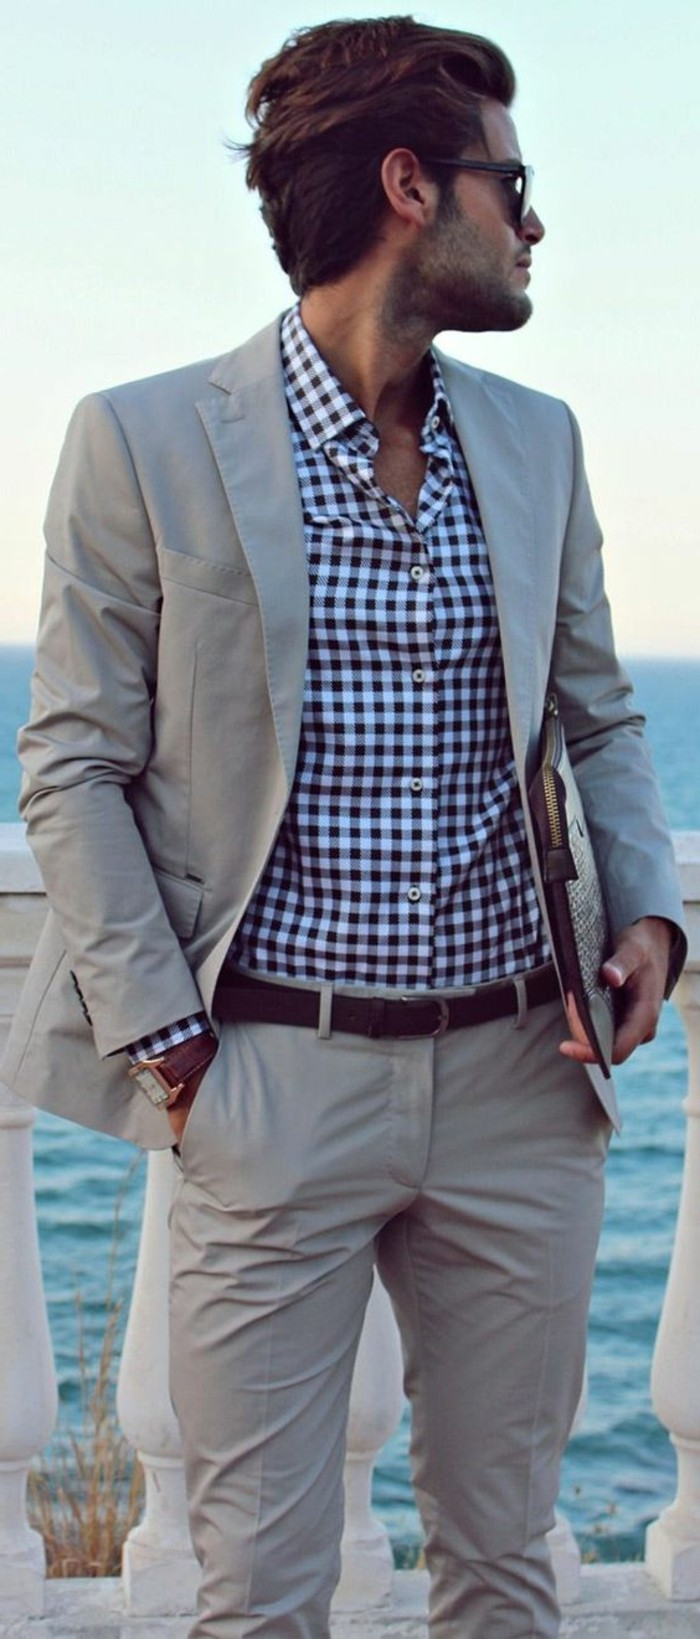 Mens Casual Summer Wedding Attire.1001 Ideas For Cool Mens Summer Wedding Attire To Try This Season